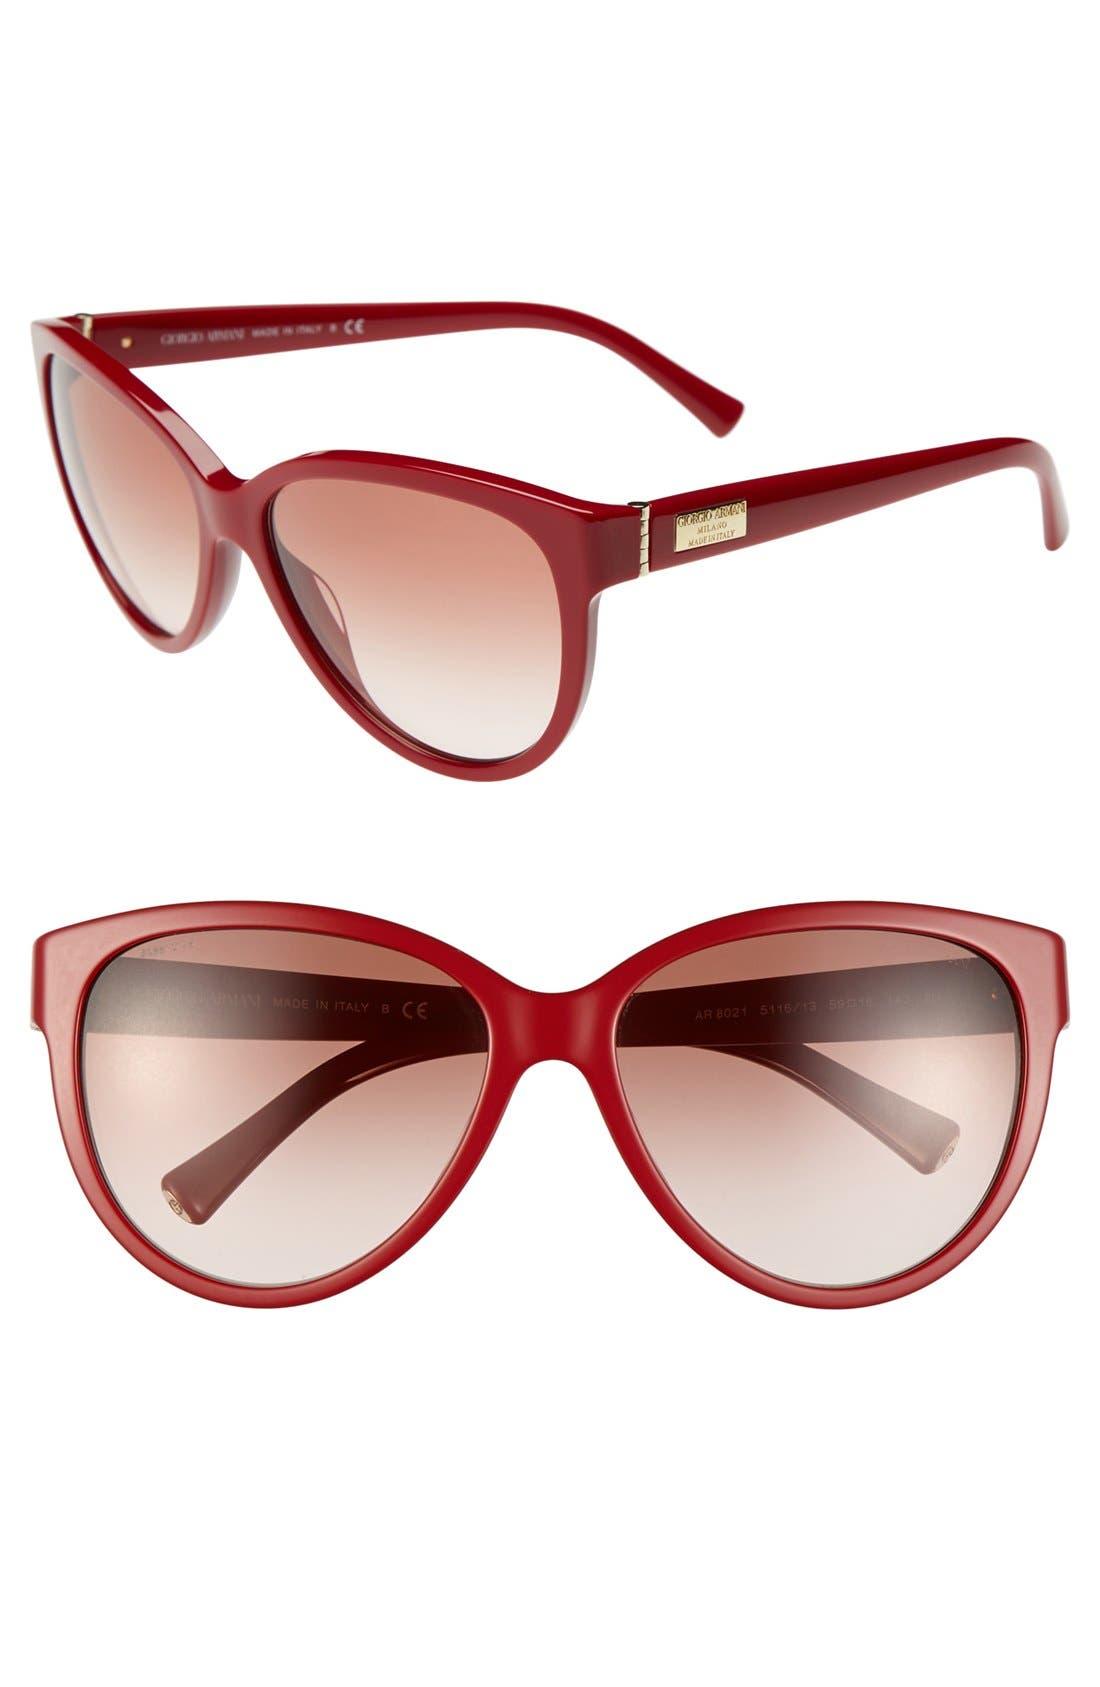 Alternate Image 1 Selected - Giorgio Armani 59mm Cat Eye Sunglasses